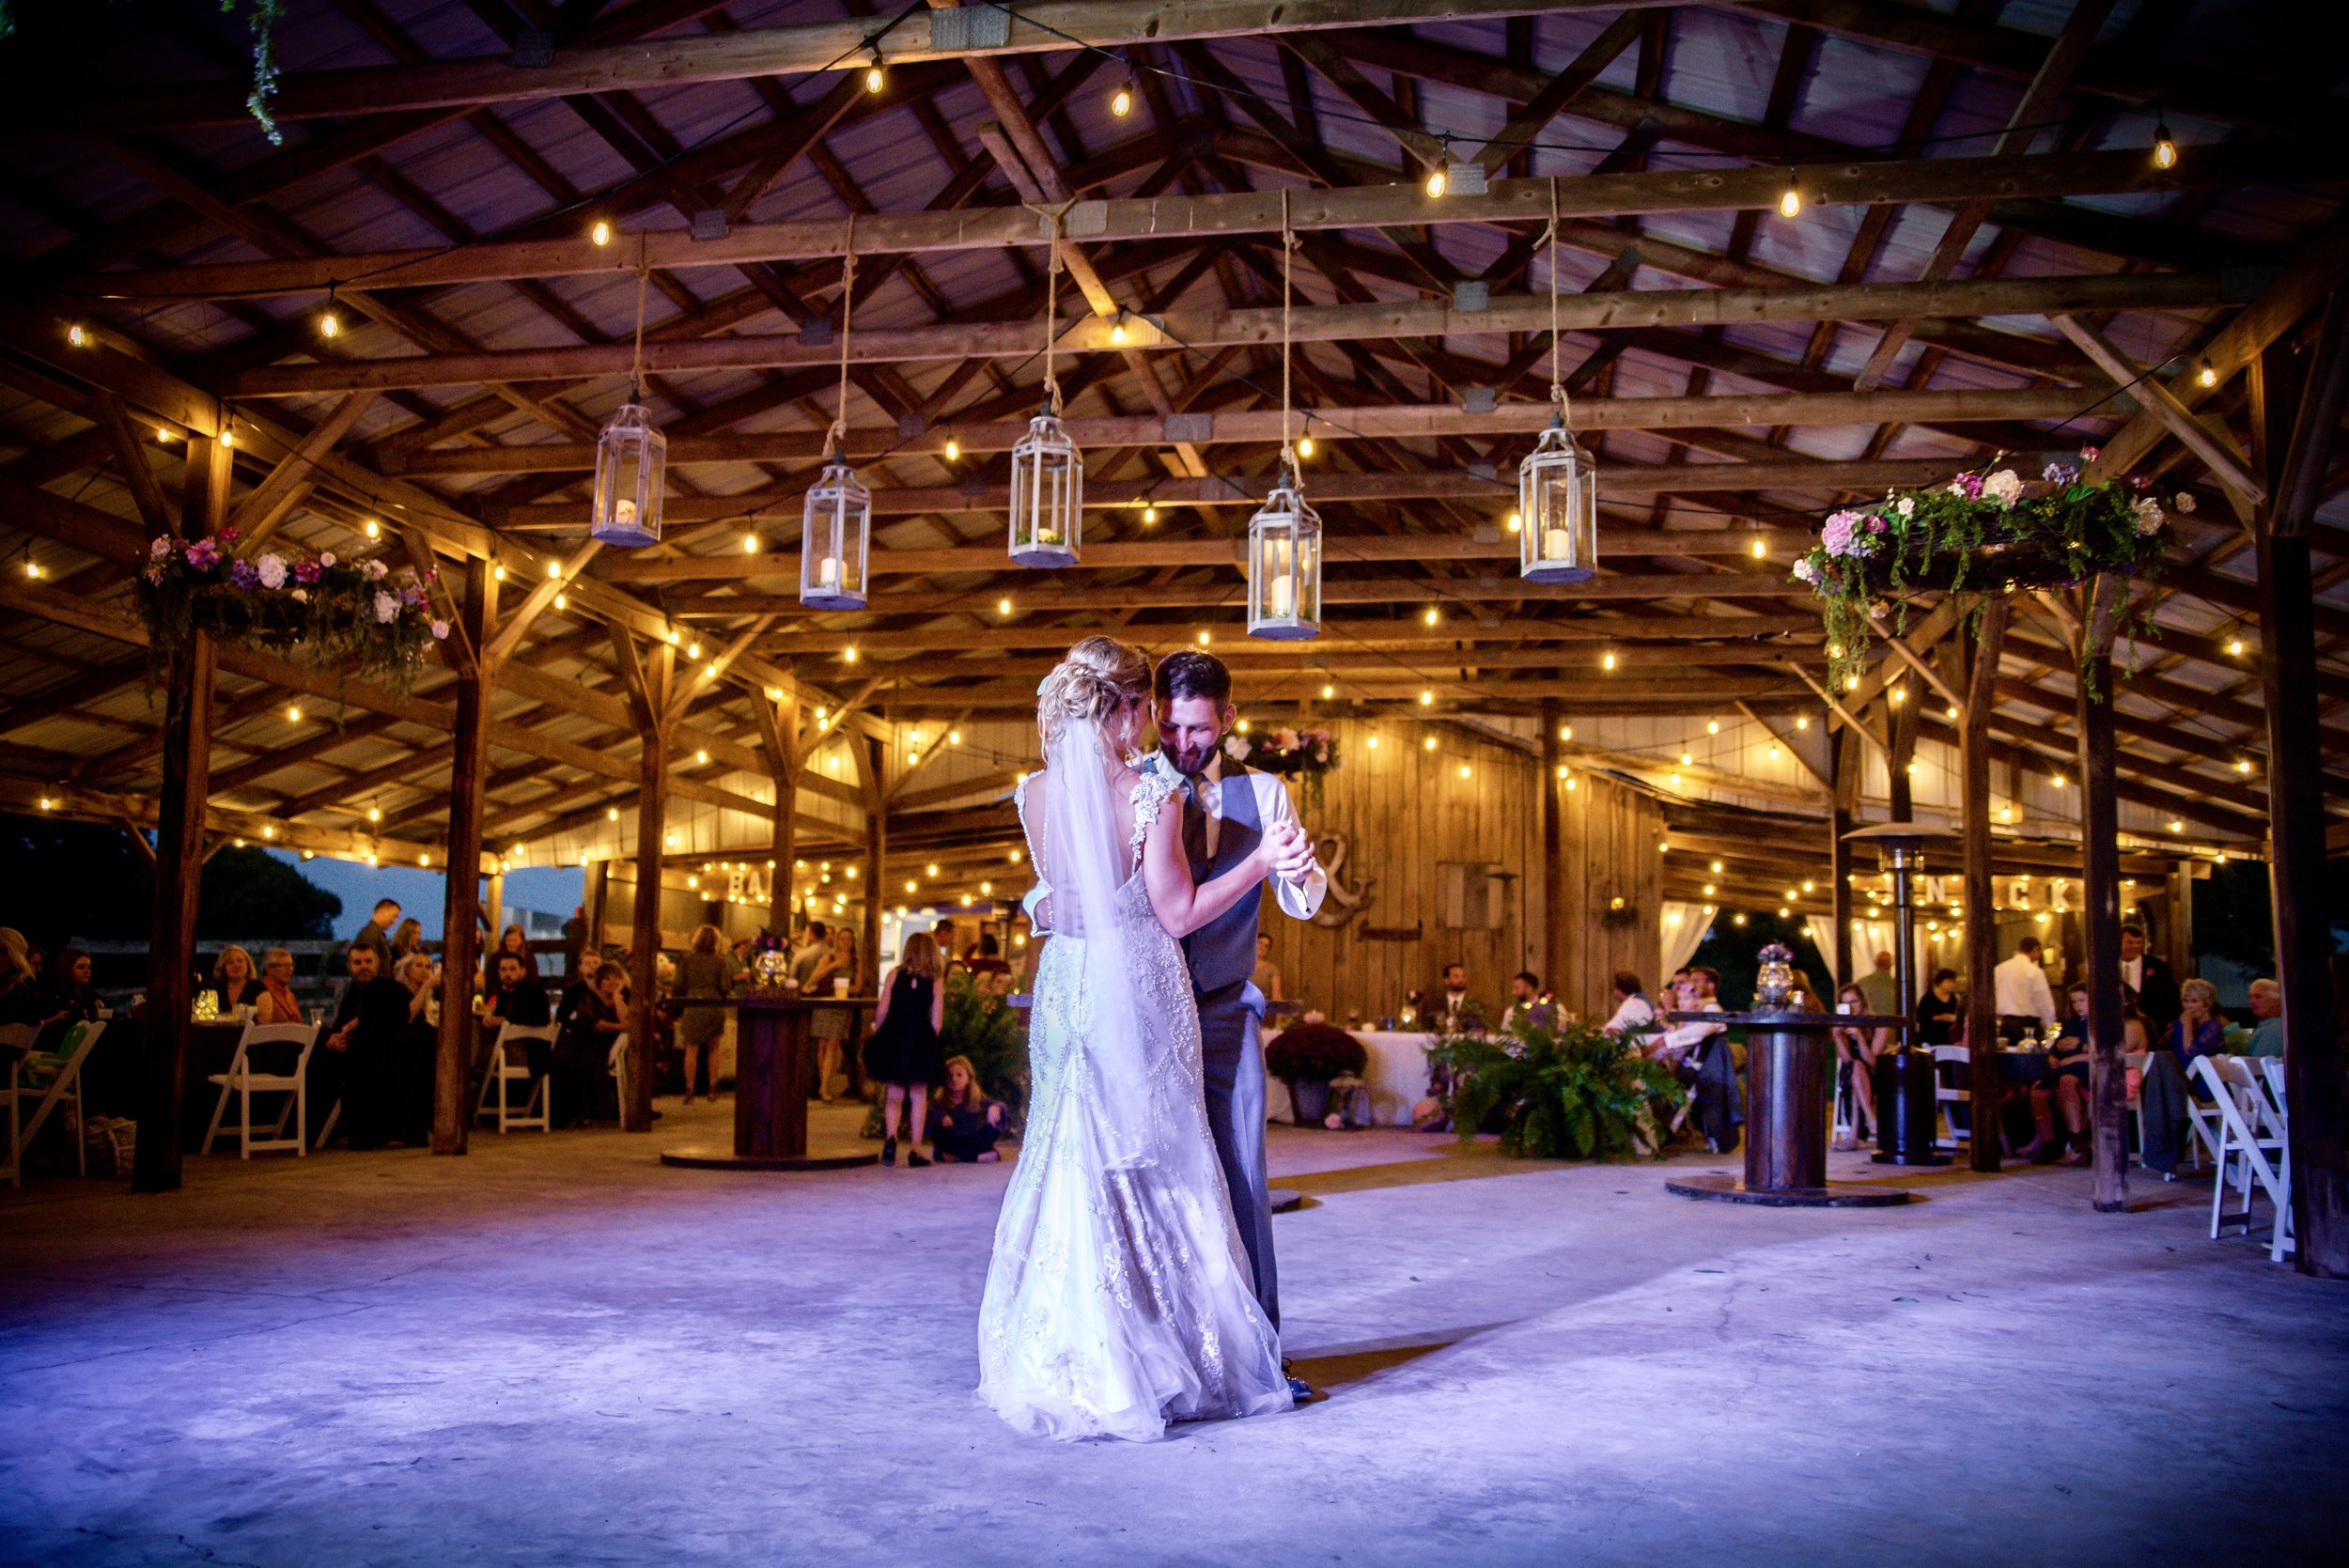 Event and Wedding Rentals